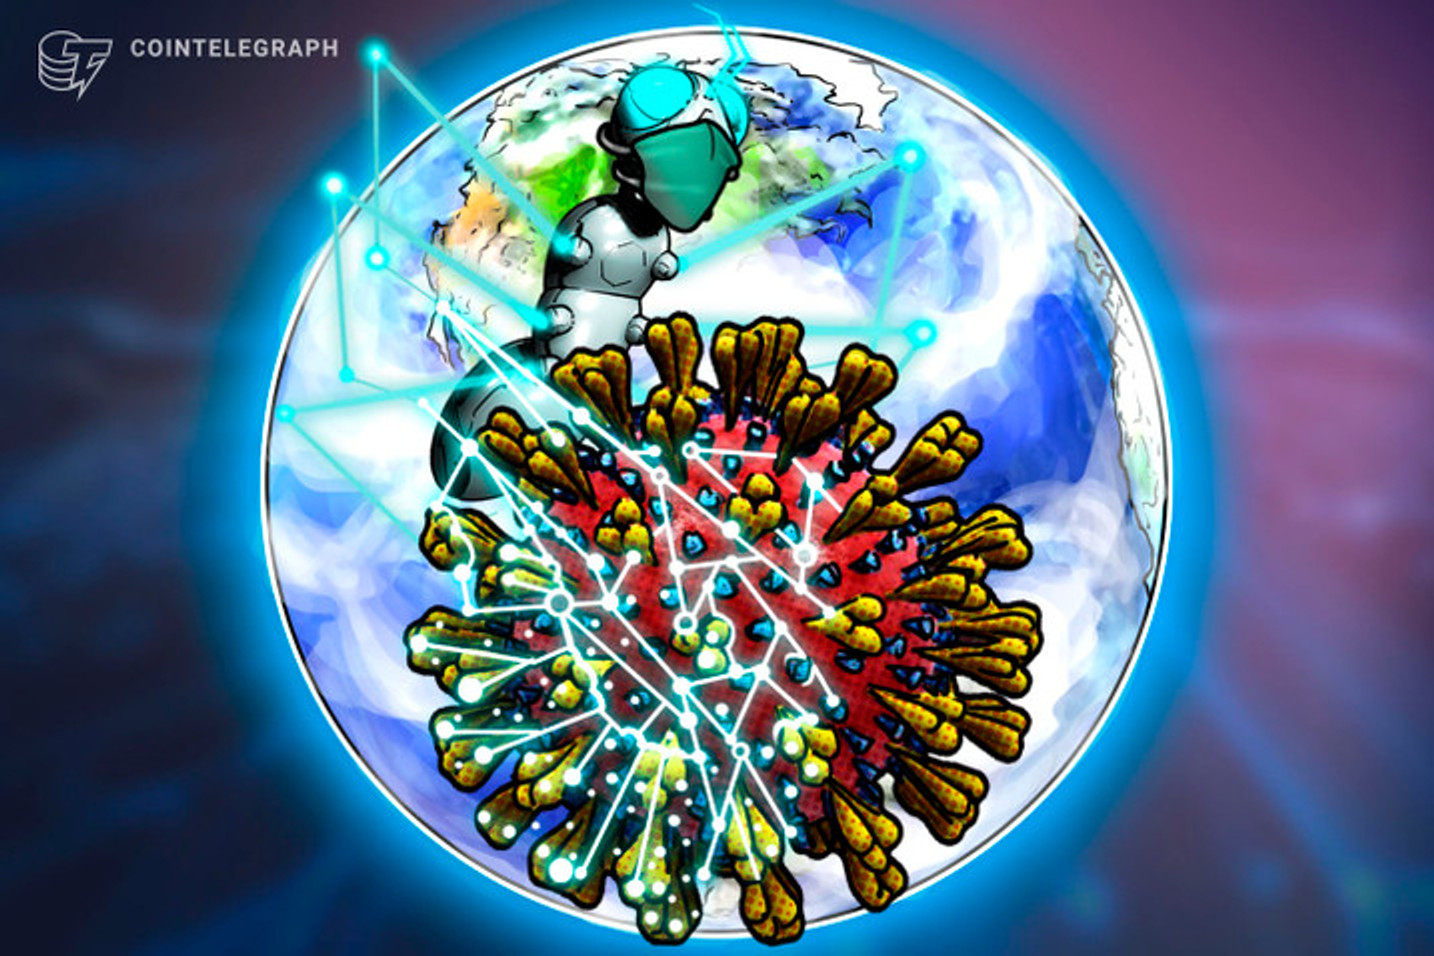 Debido al Coronavirus, Blockchain Summit Latam Panamá 2020 se suspende hasta nuevo aviso